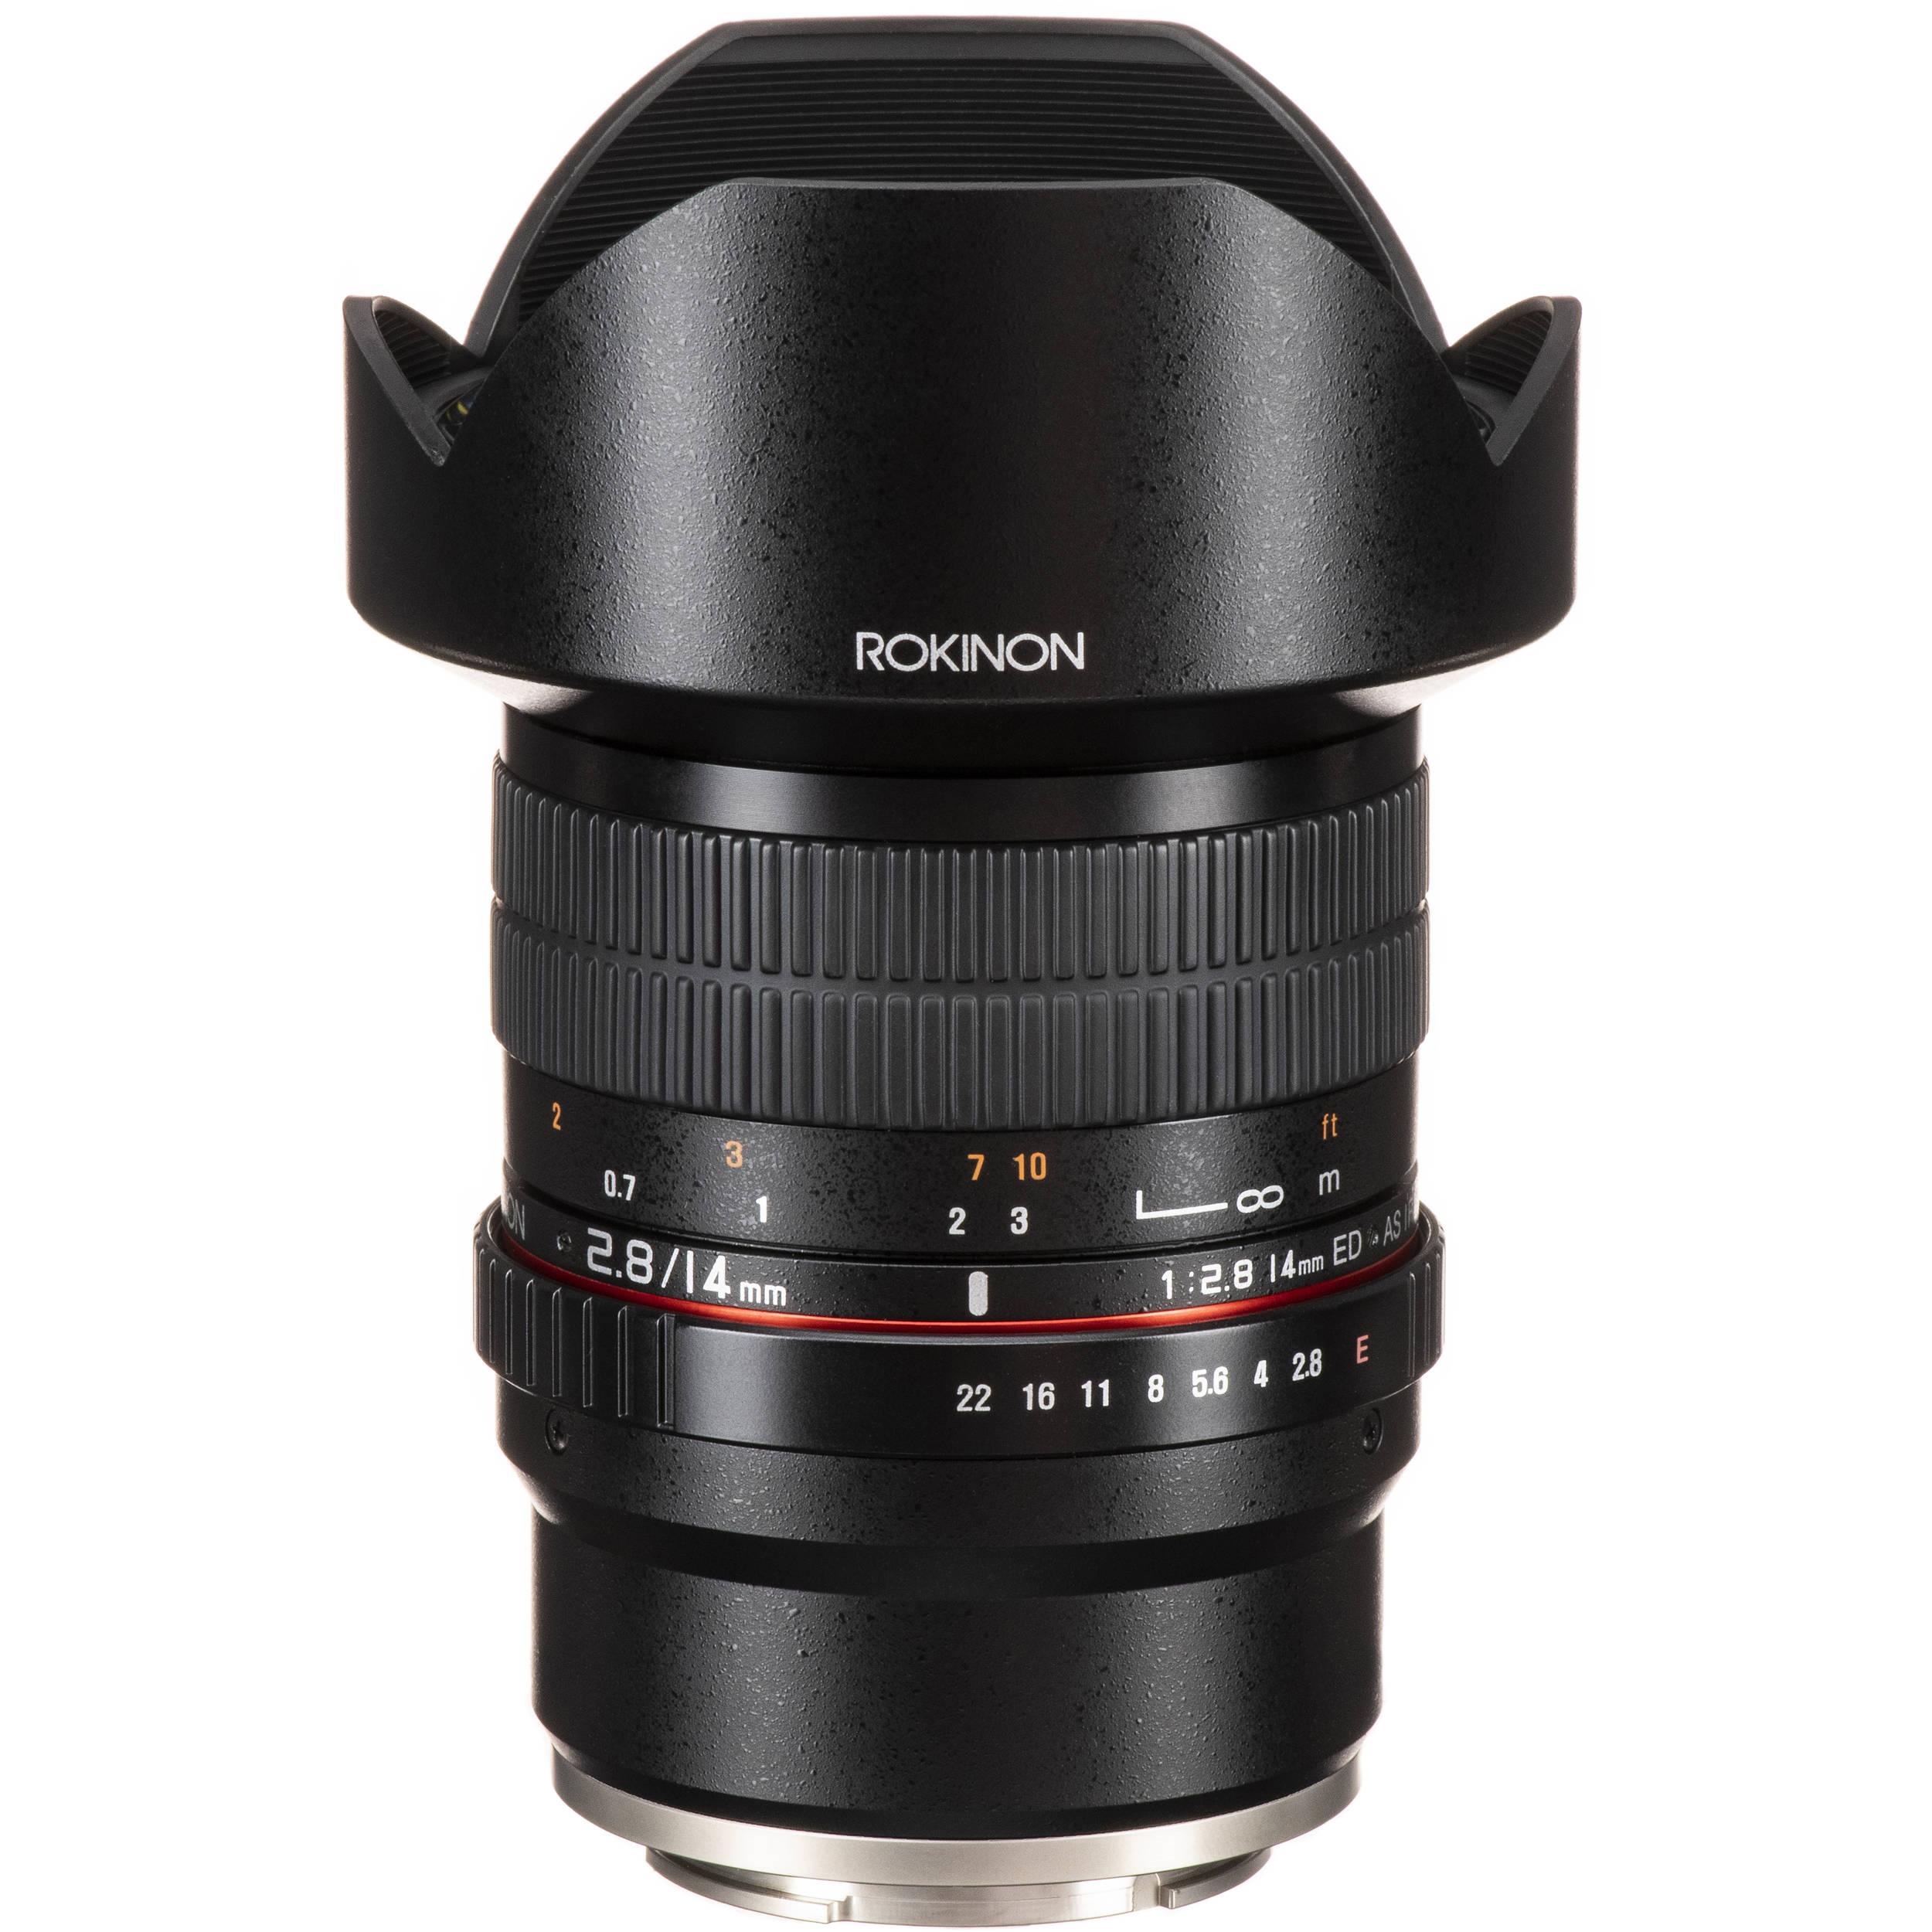 Rokinon 14mm f/2 8 ED AS IF UMC Lens for Sony E-Mount